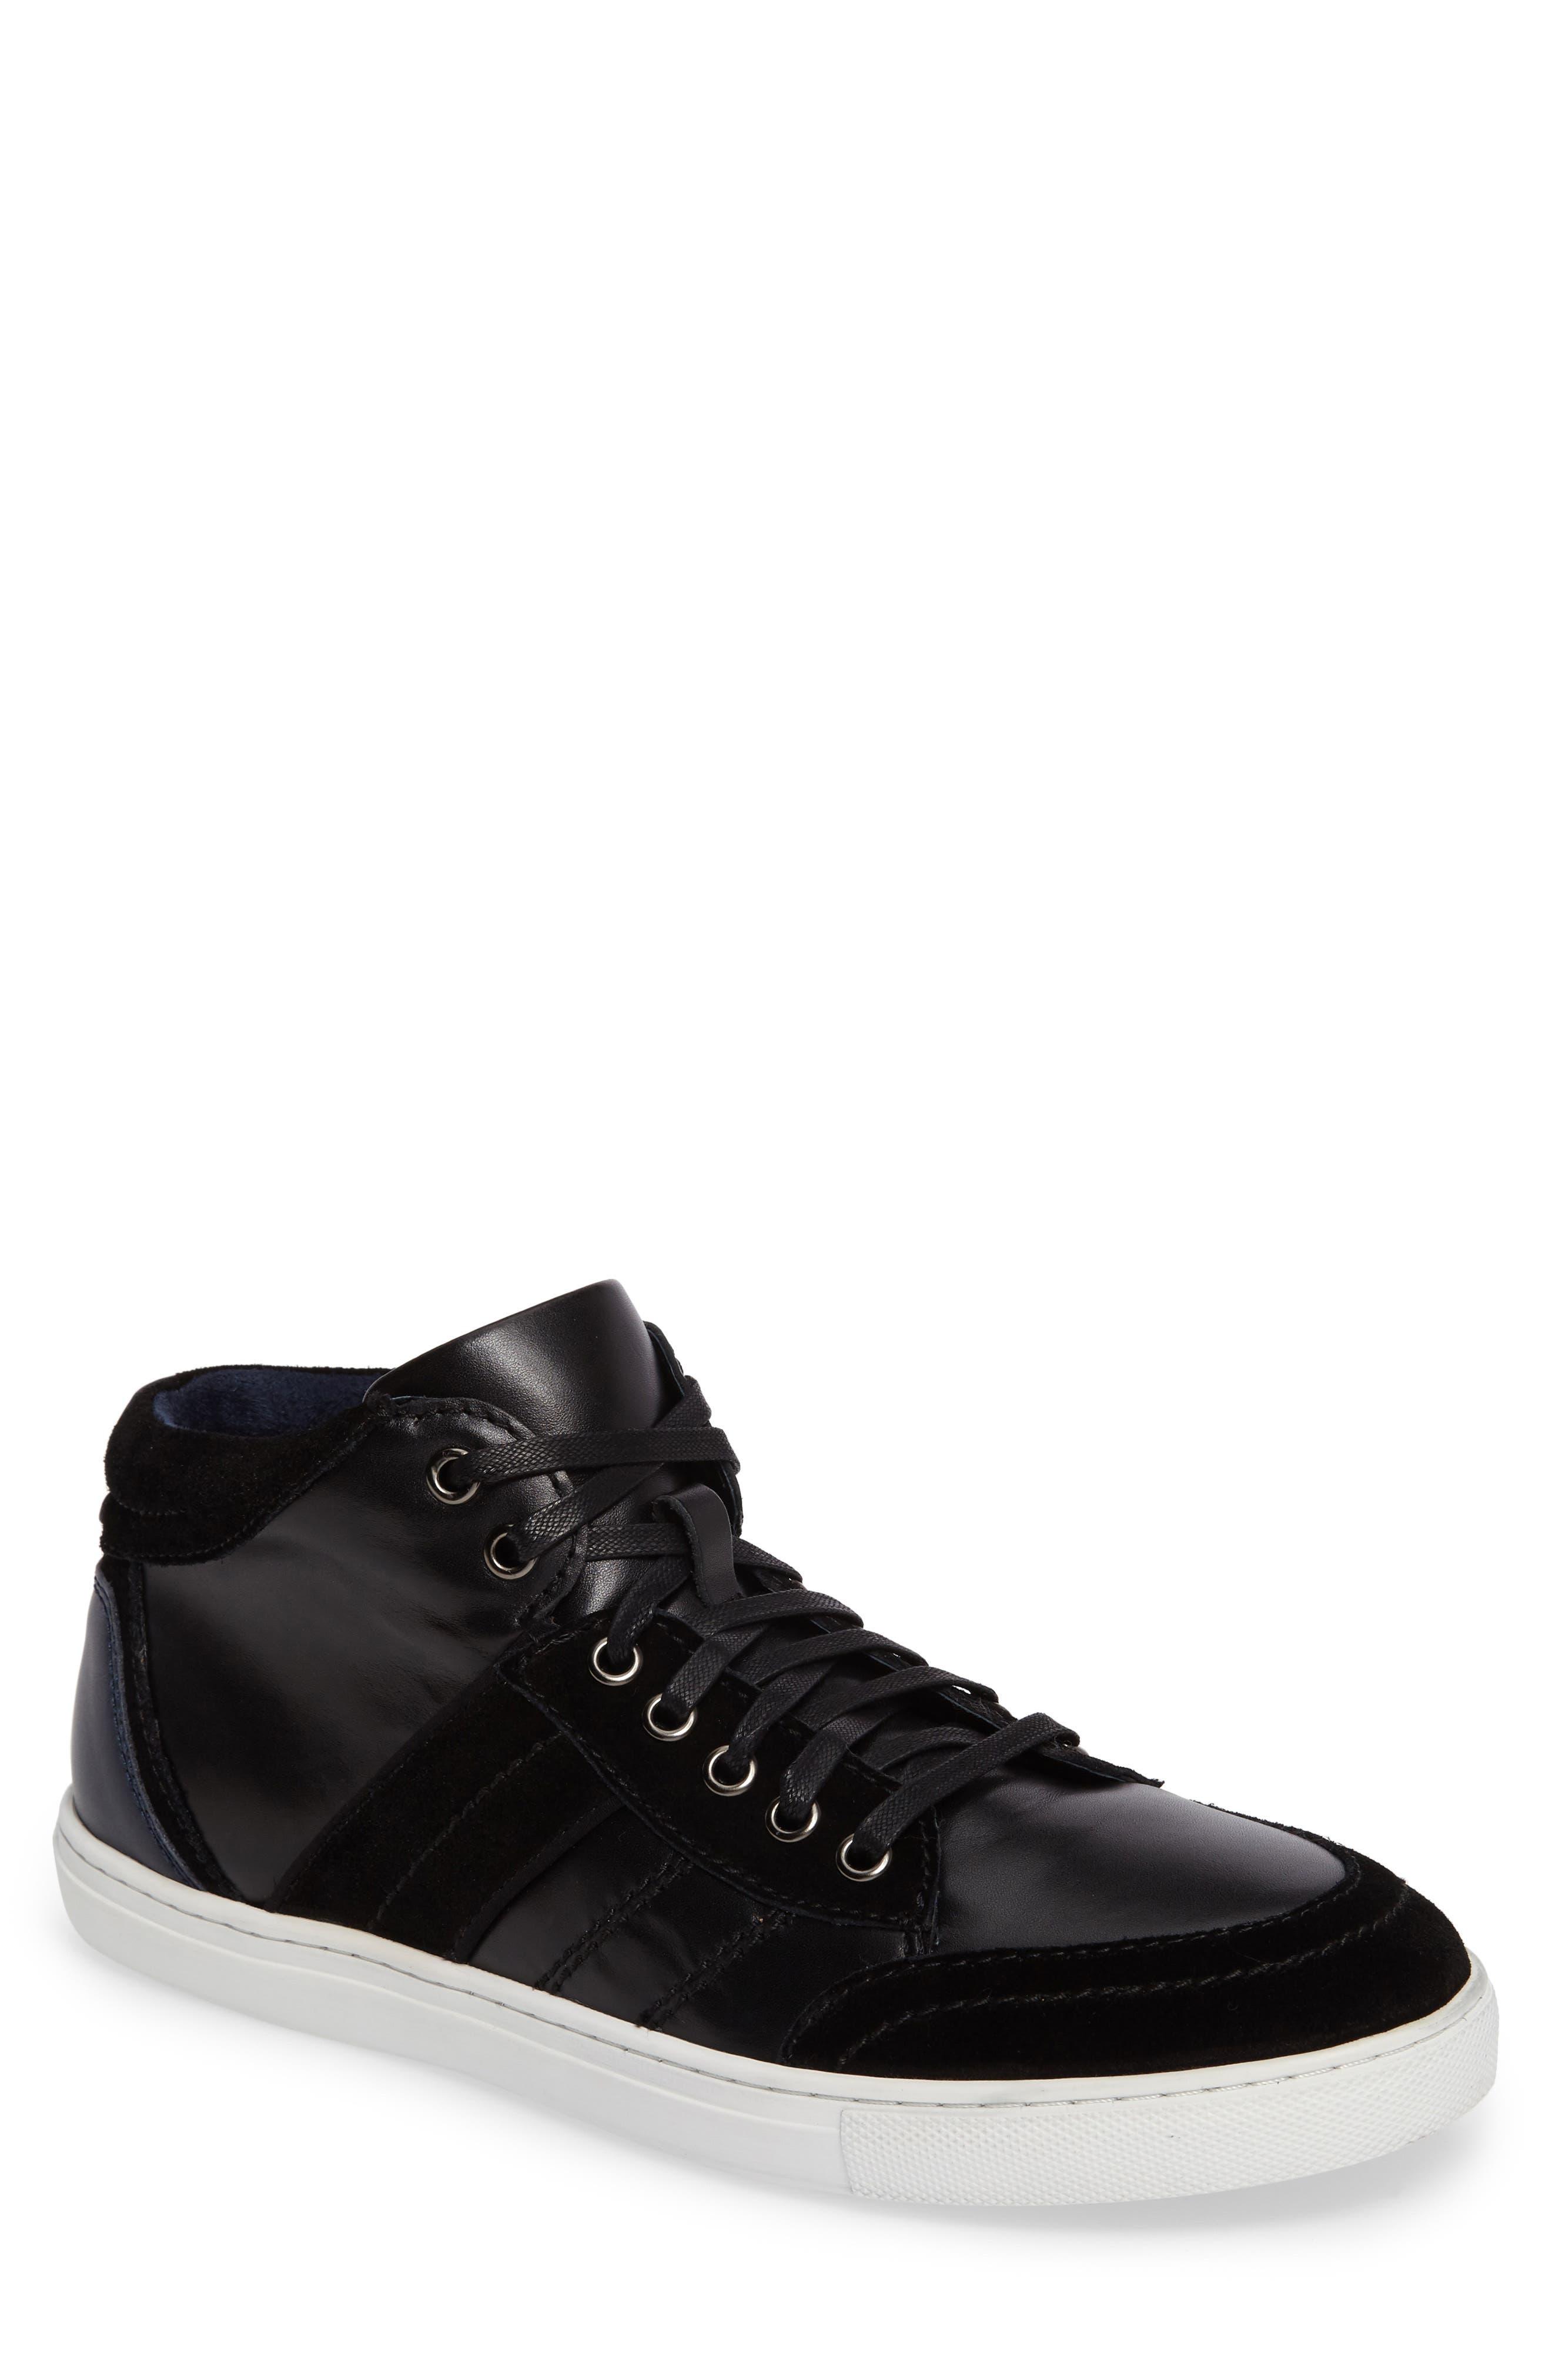 Viper Sneaker,                         Main,                         color, BLACK